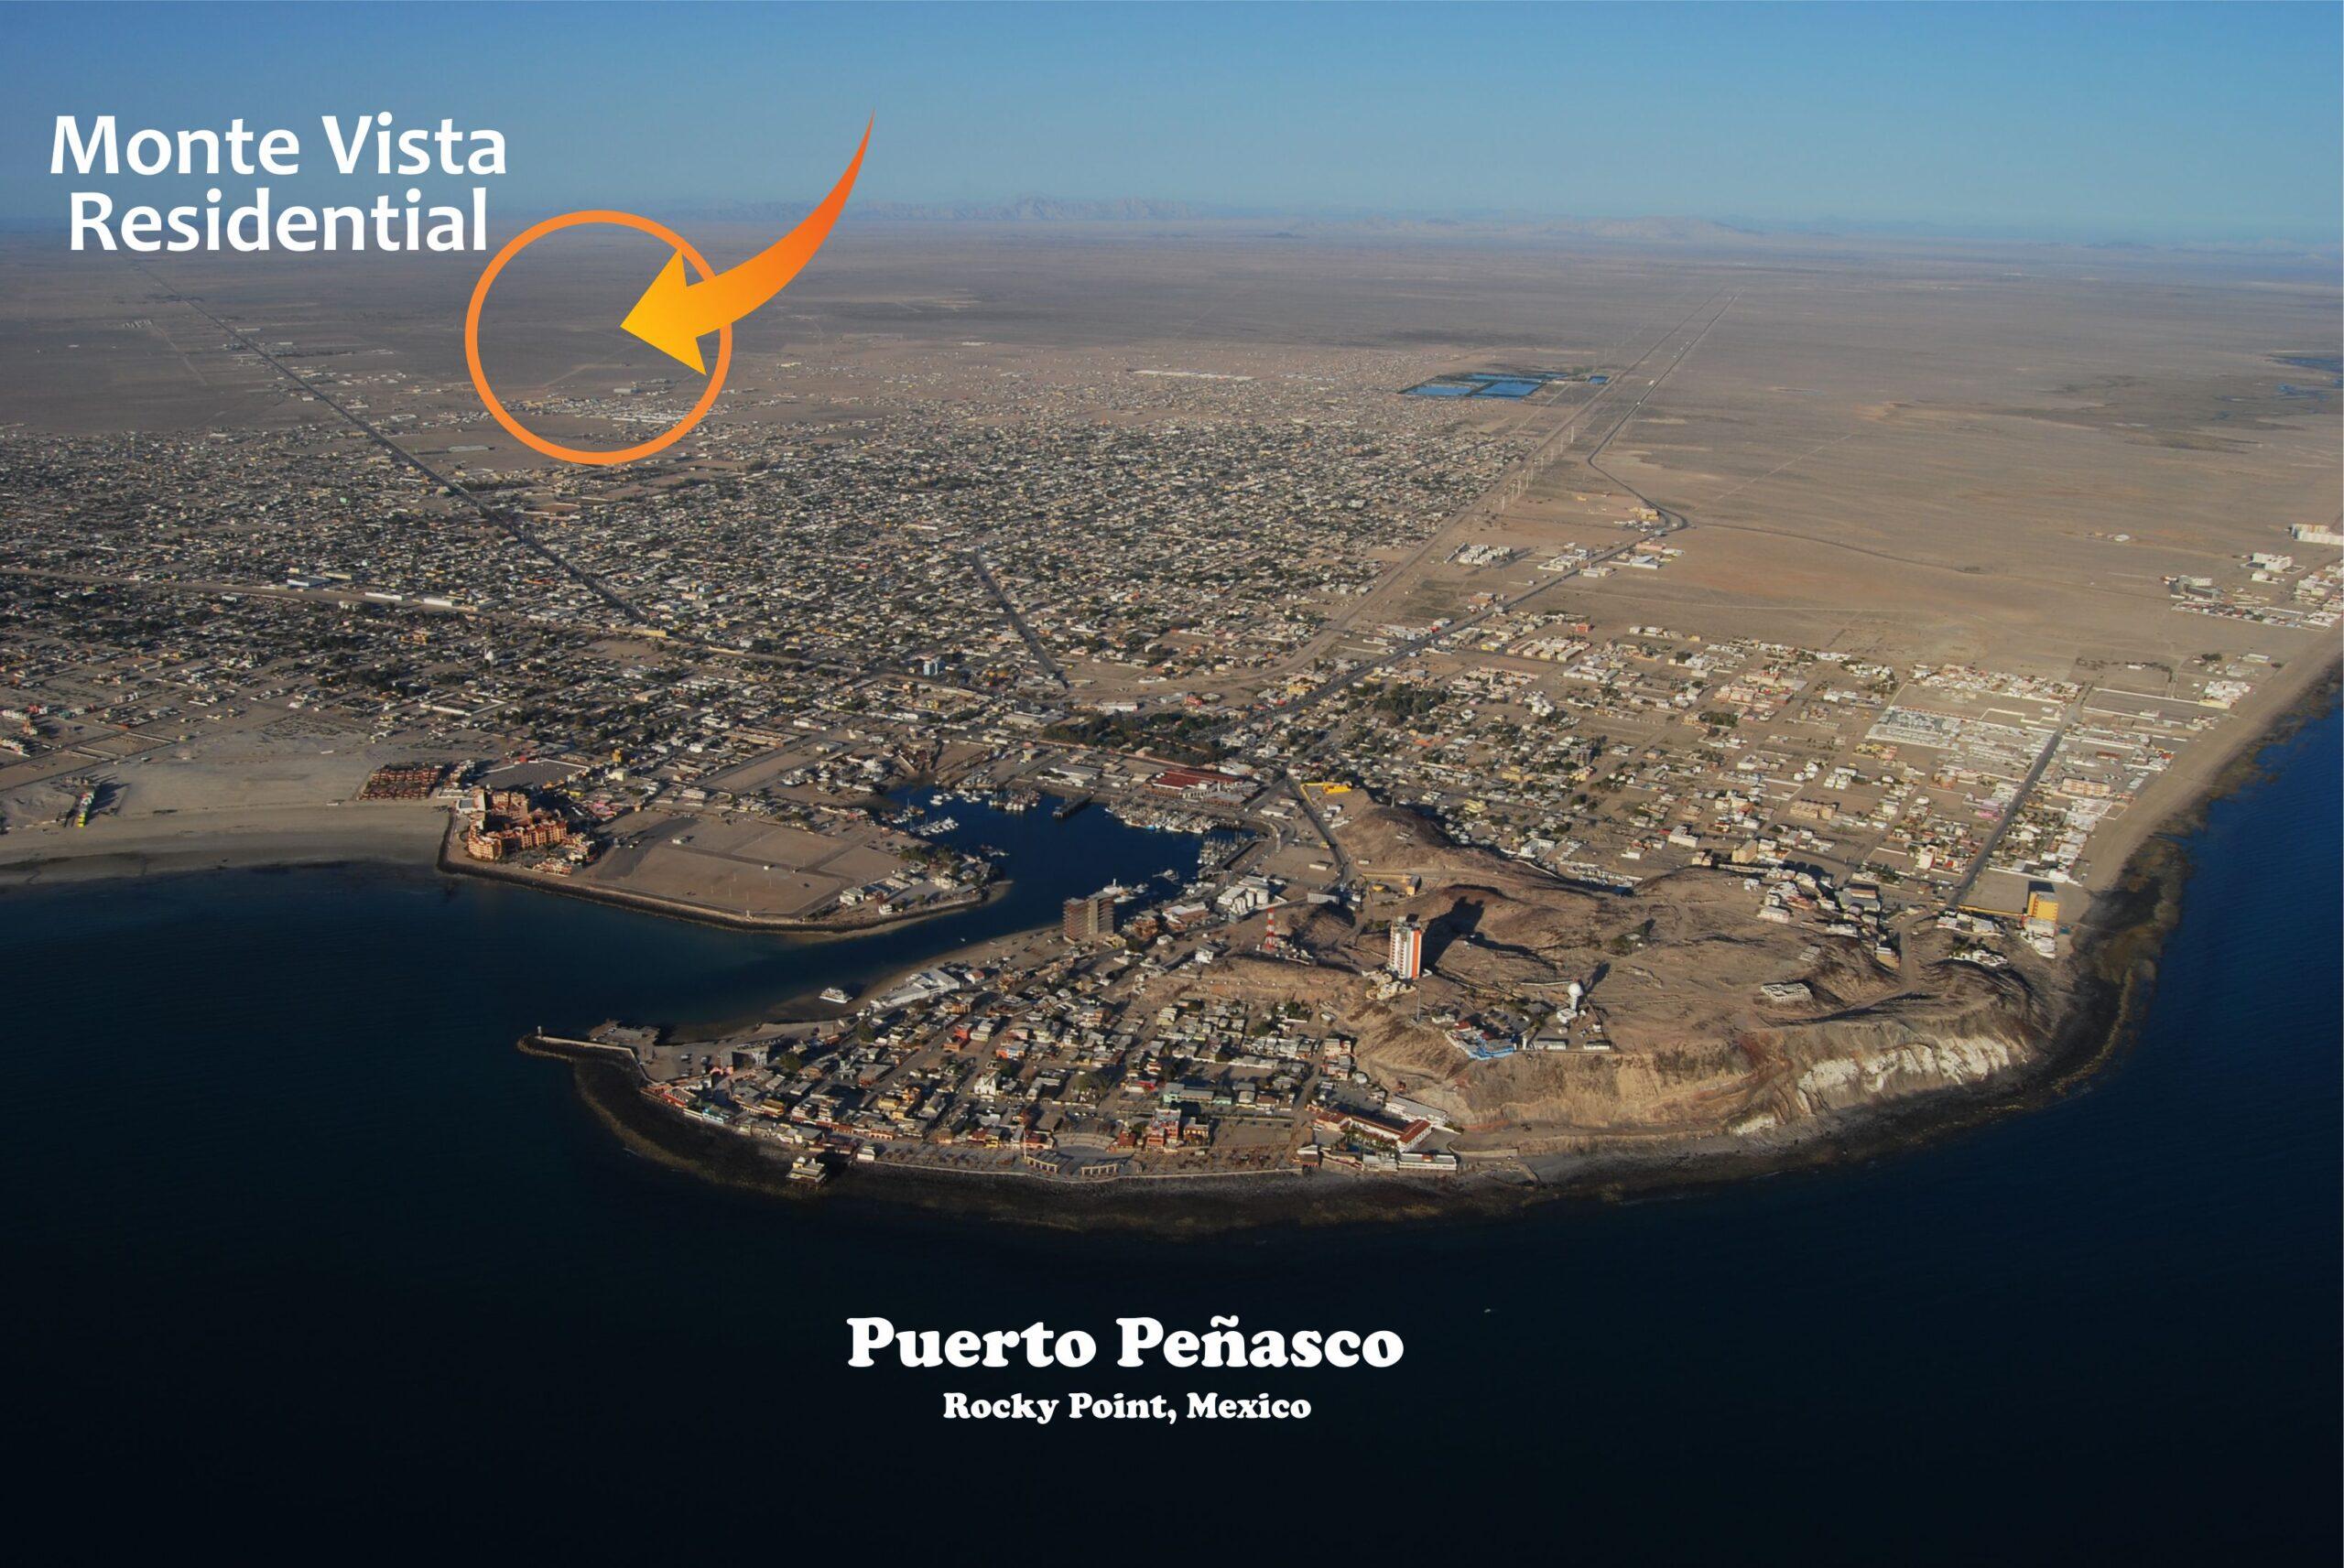 http://www.montevistamexico.com/web/wp-content/uploads/2021/03/MONTE-VISTA-LOCATION-scaled.jpg